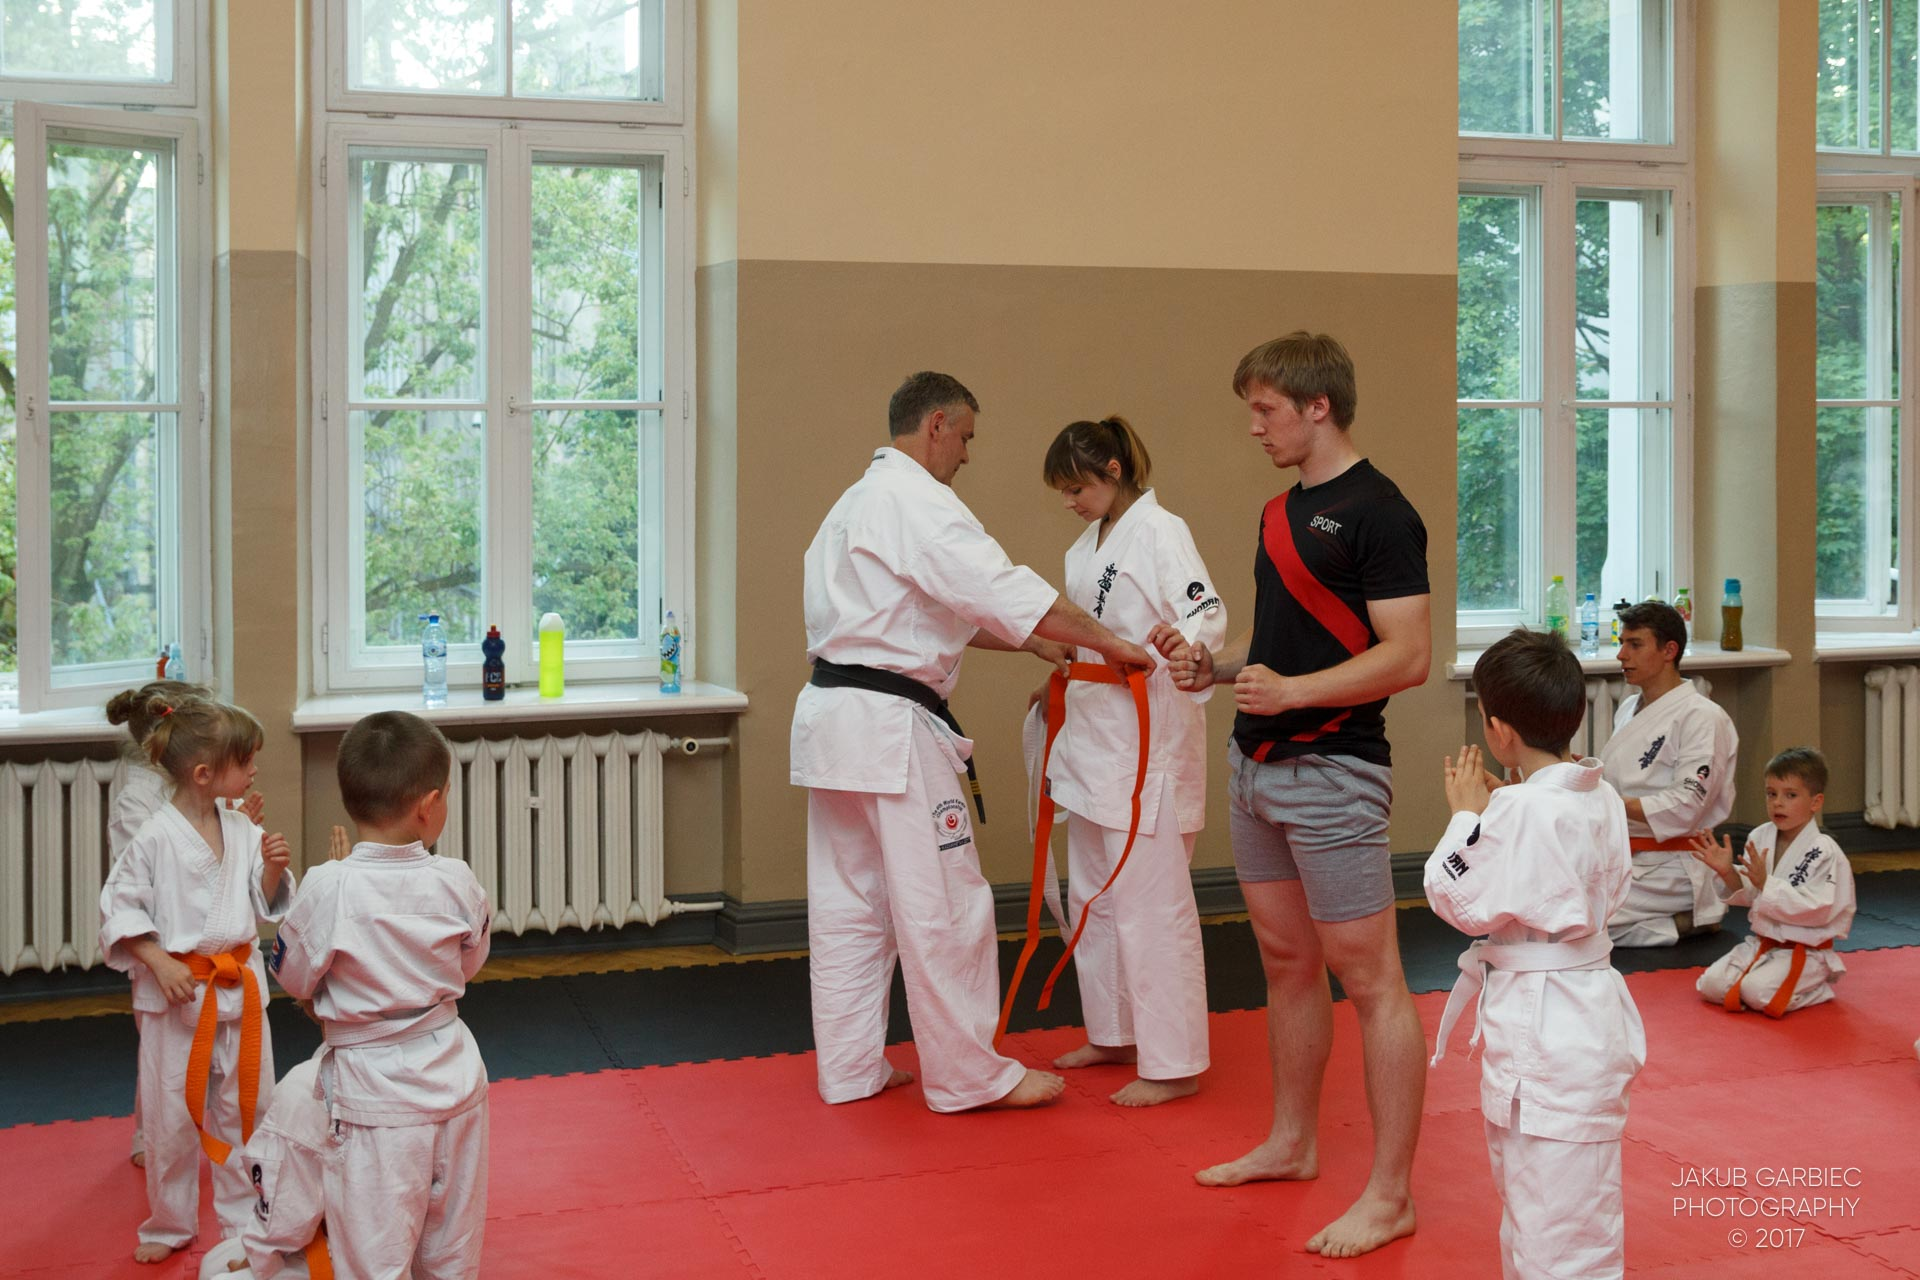 egzamin-karate-mistrz-mariusz-mazur-klub-karate-shodan-2017-06-02-19